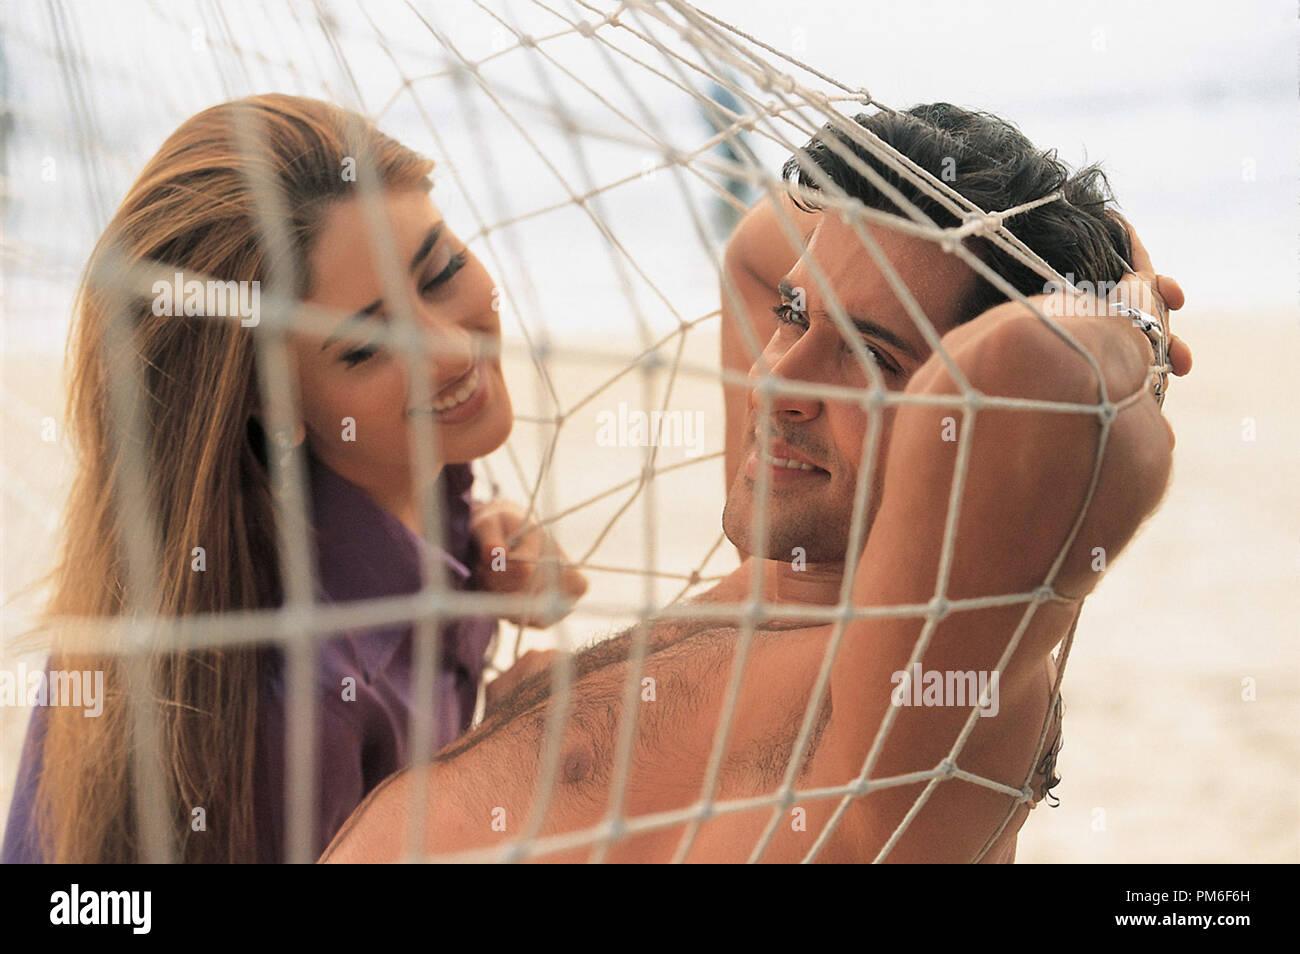 Hrithik Stock Photos & Hrithik Stock Images - Alamy